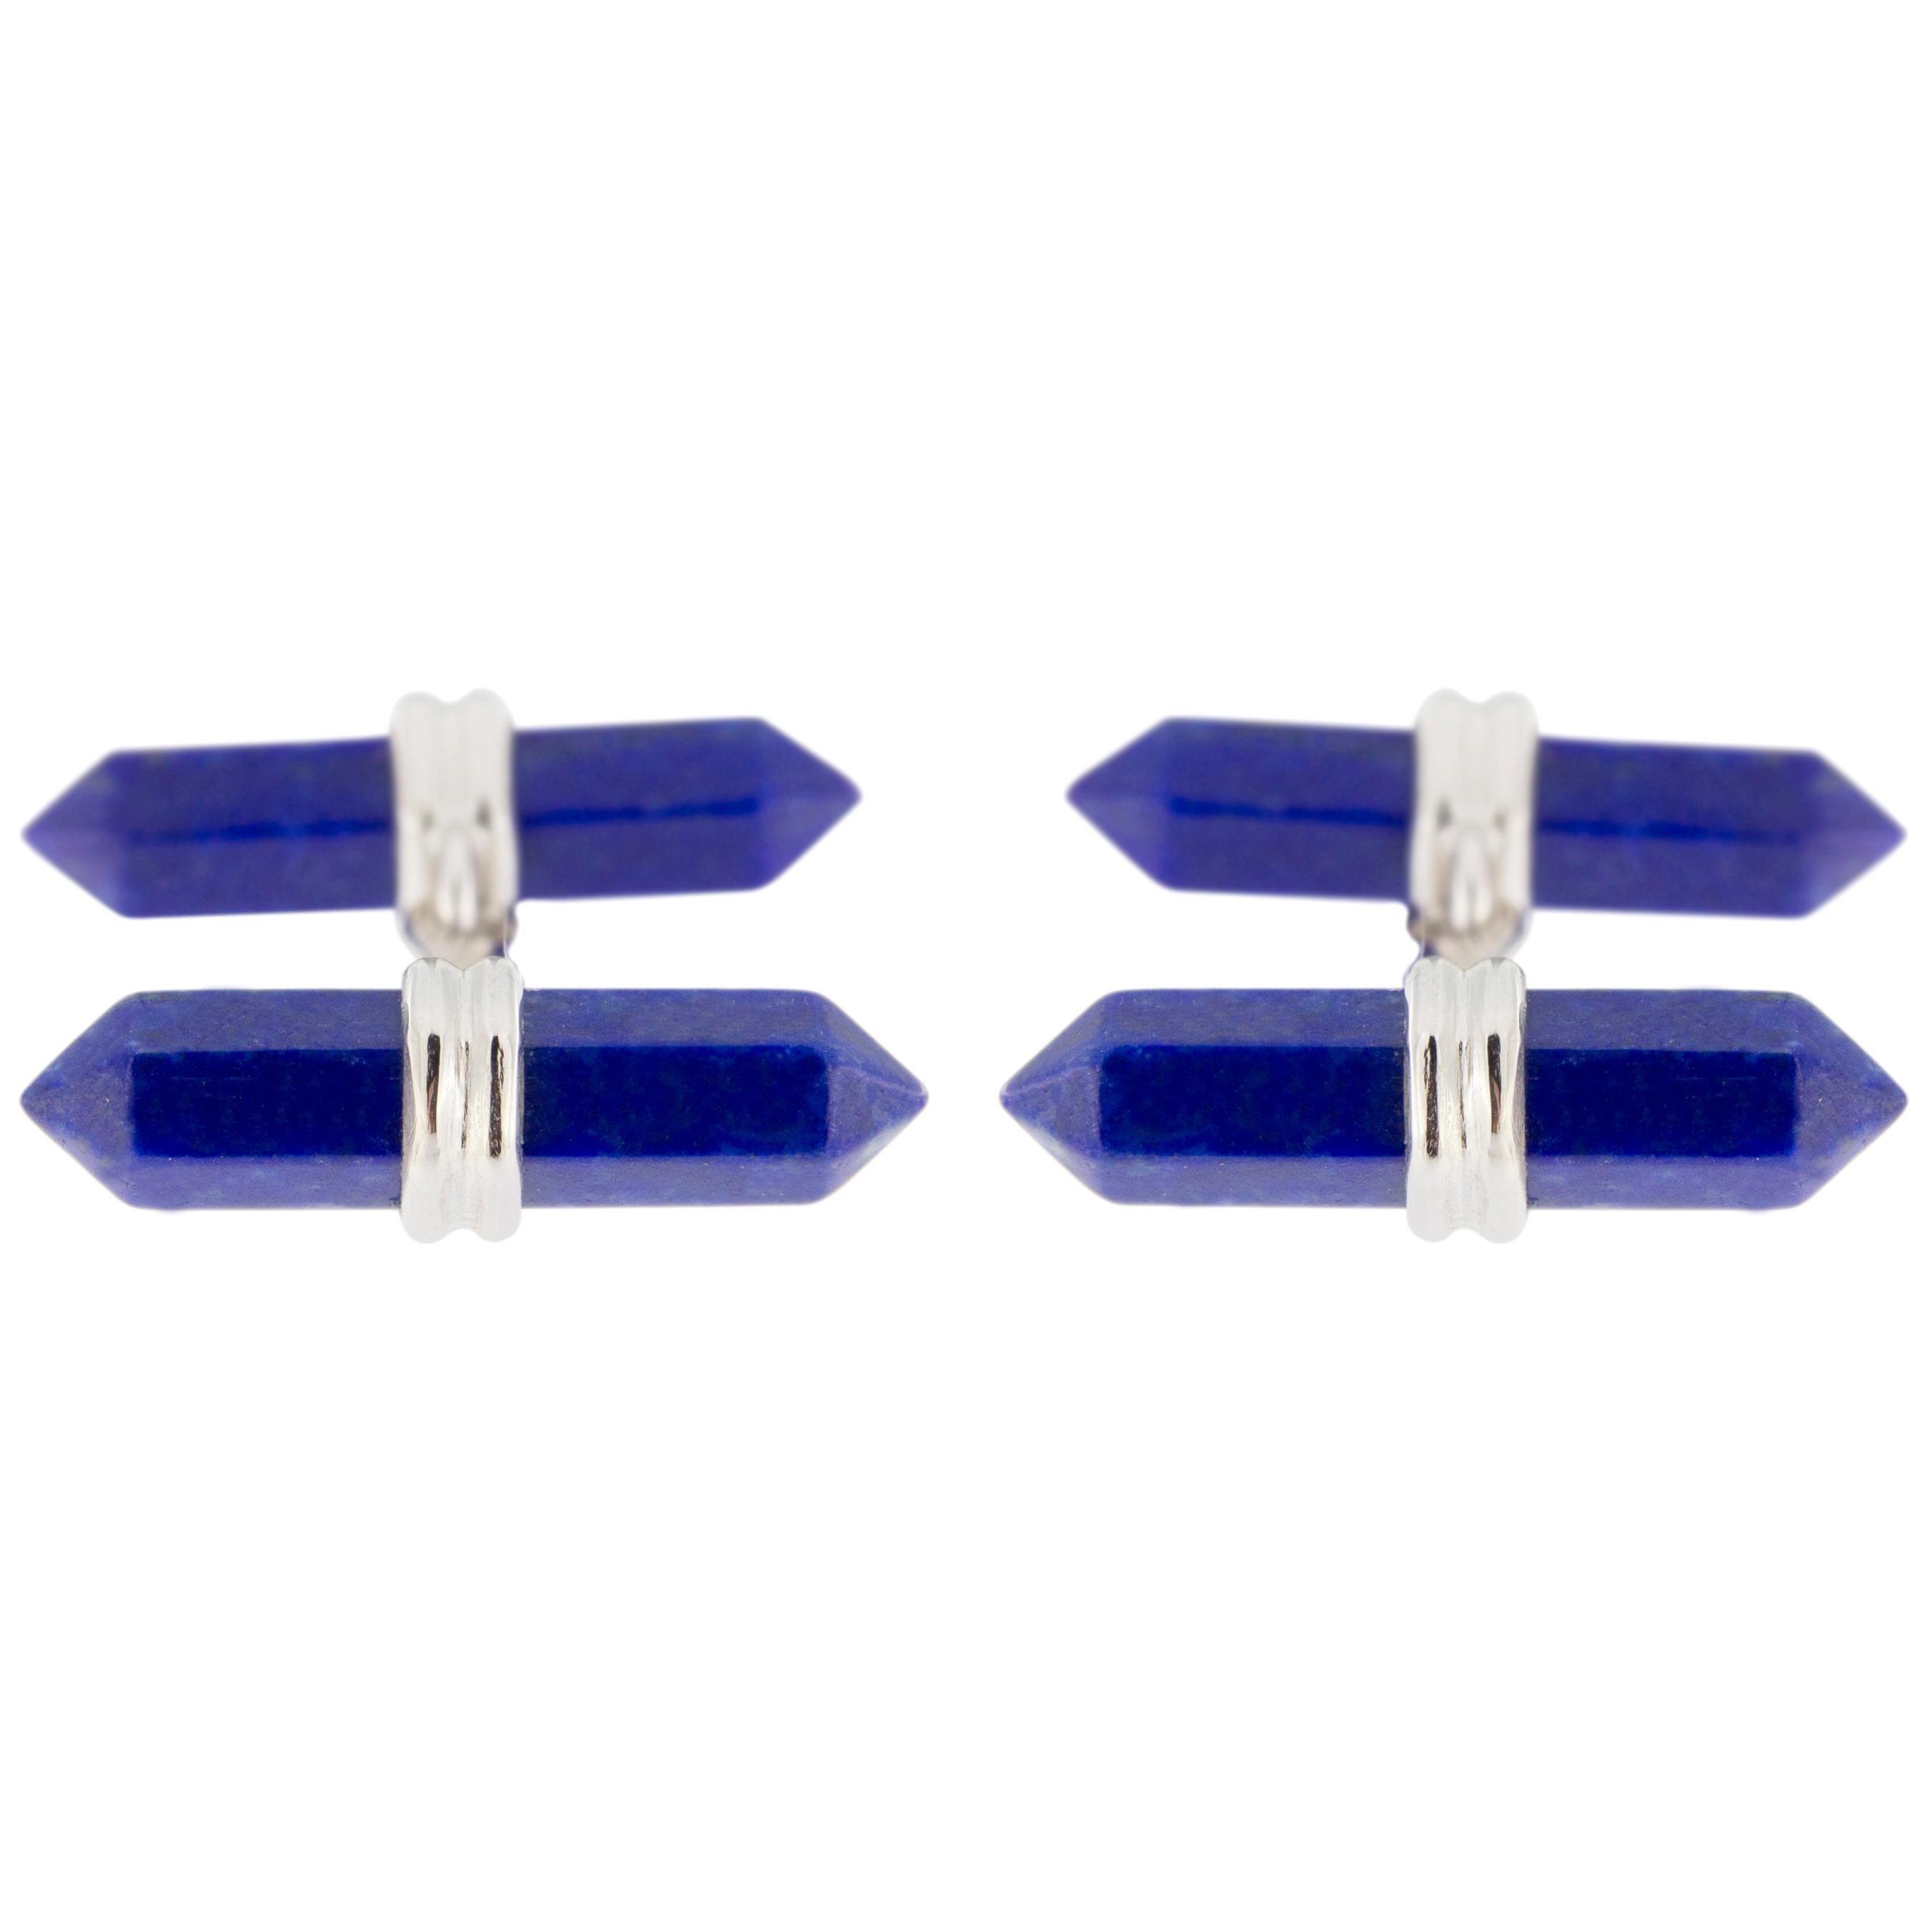 Jona Lapis Lazuli Prism Bar Sterling Silver Cufflinks